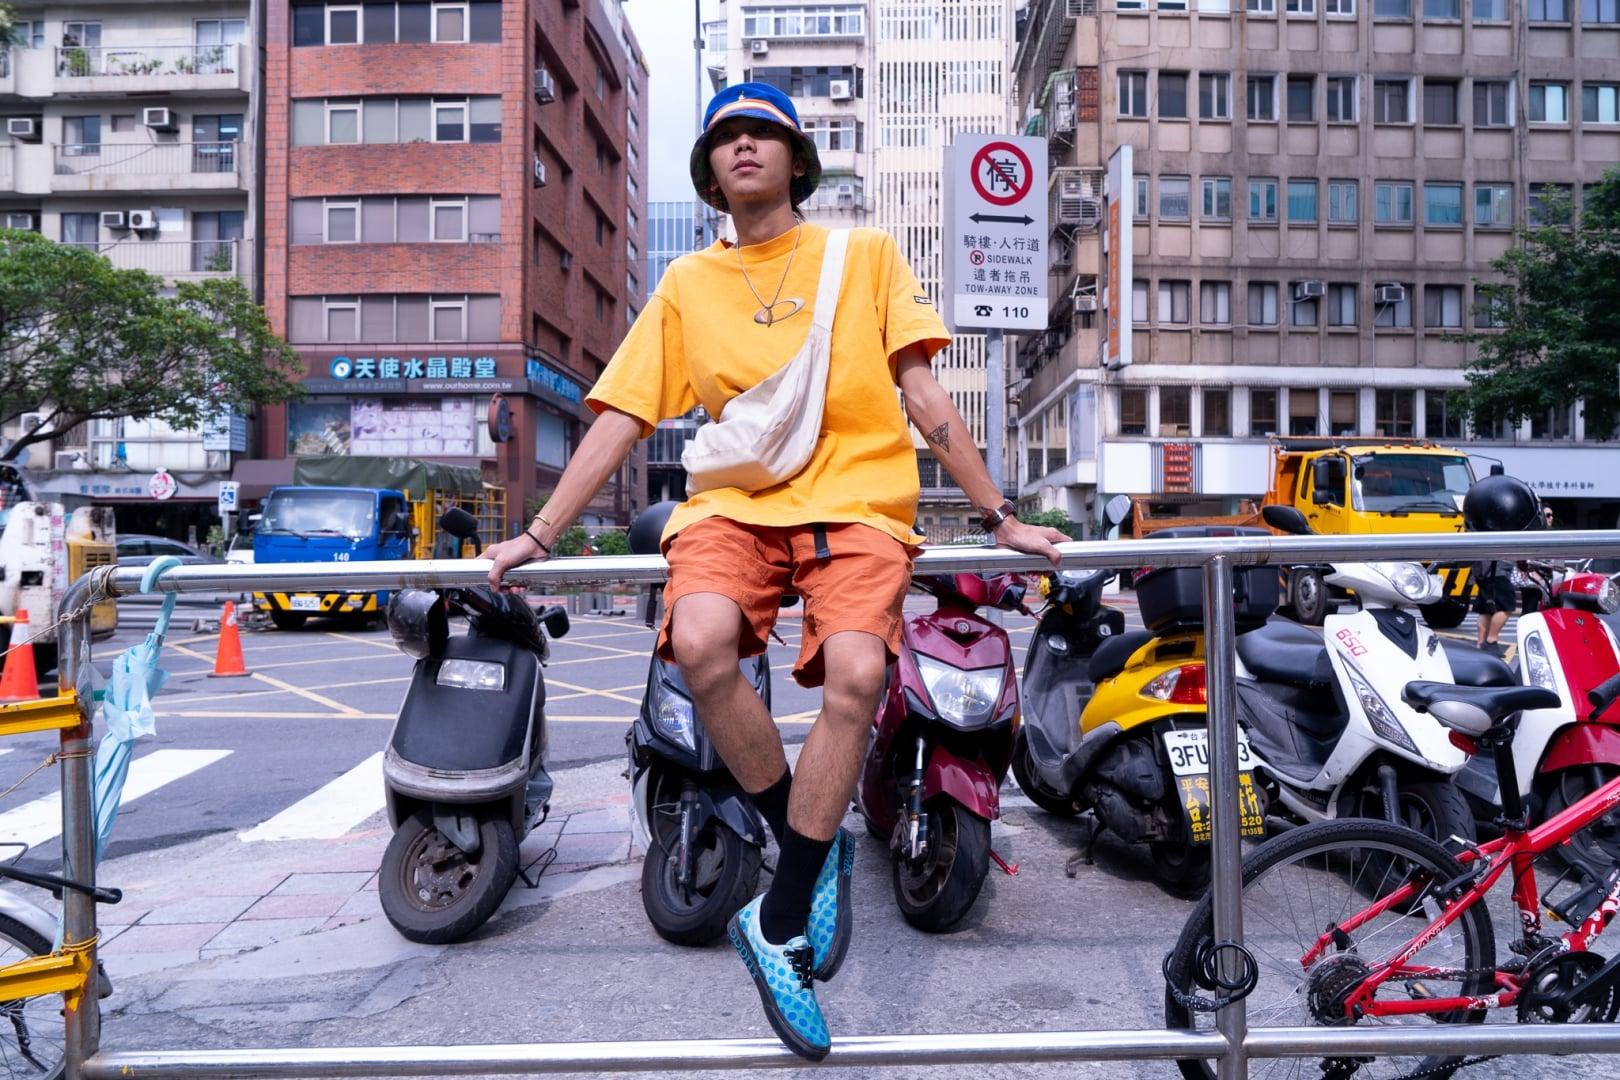 # Seek And Snap:穿梭於這個都市中不入主流也不失自己風格 3